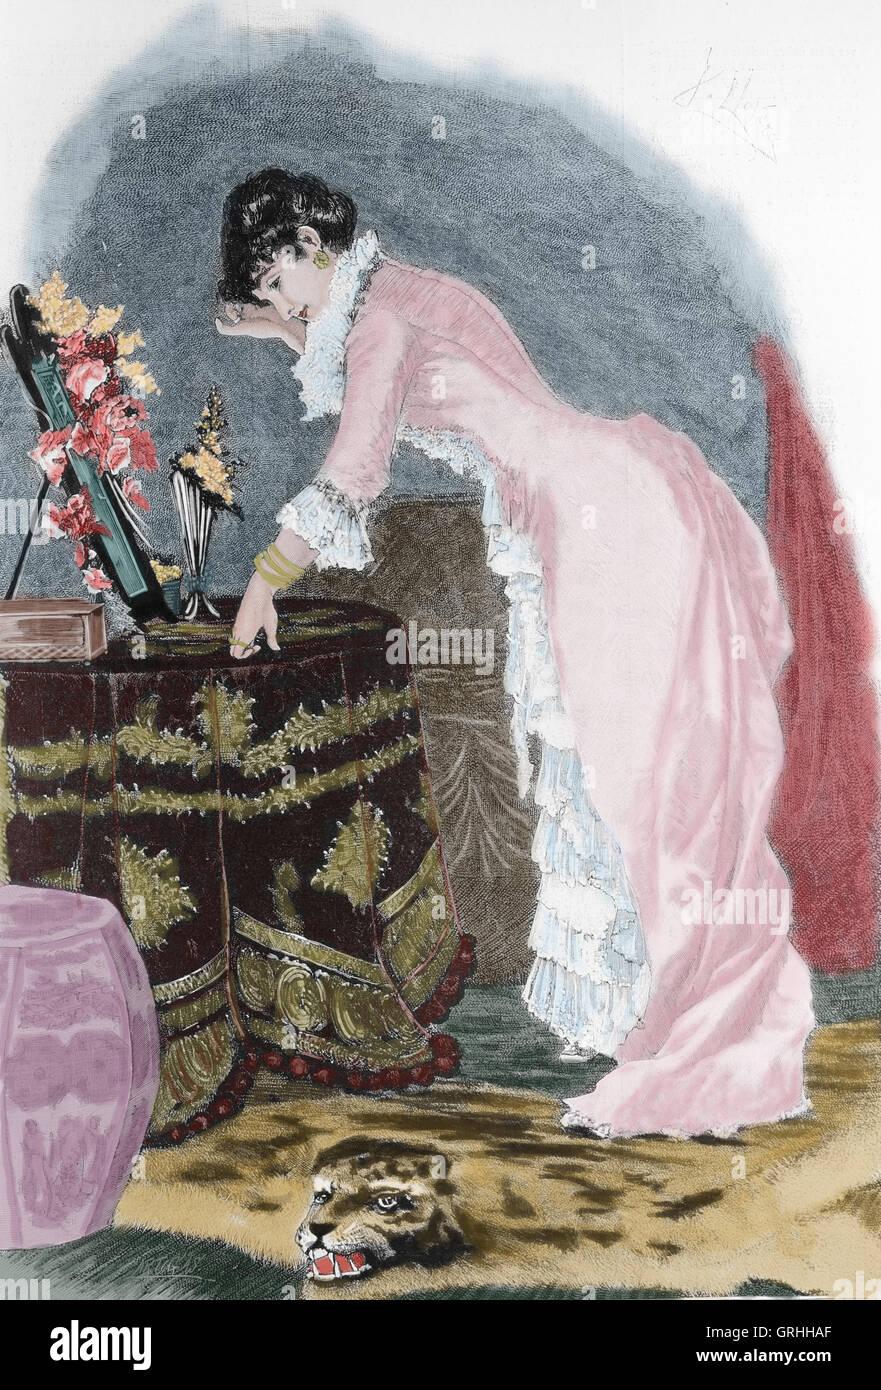 Bourgeois woman. Engraving by Artigas. La Ilustracion Artistica, 1885, Spain.1885. - Stock Image